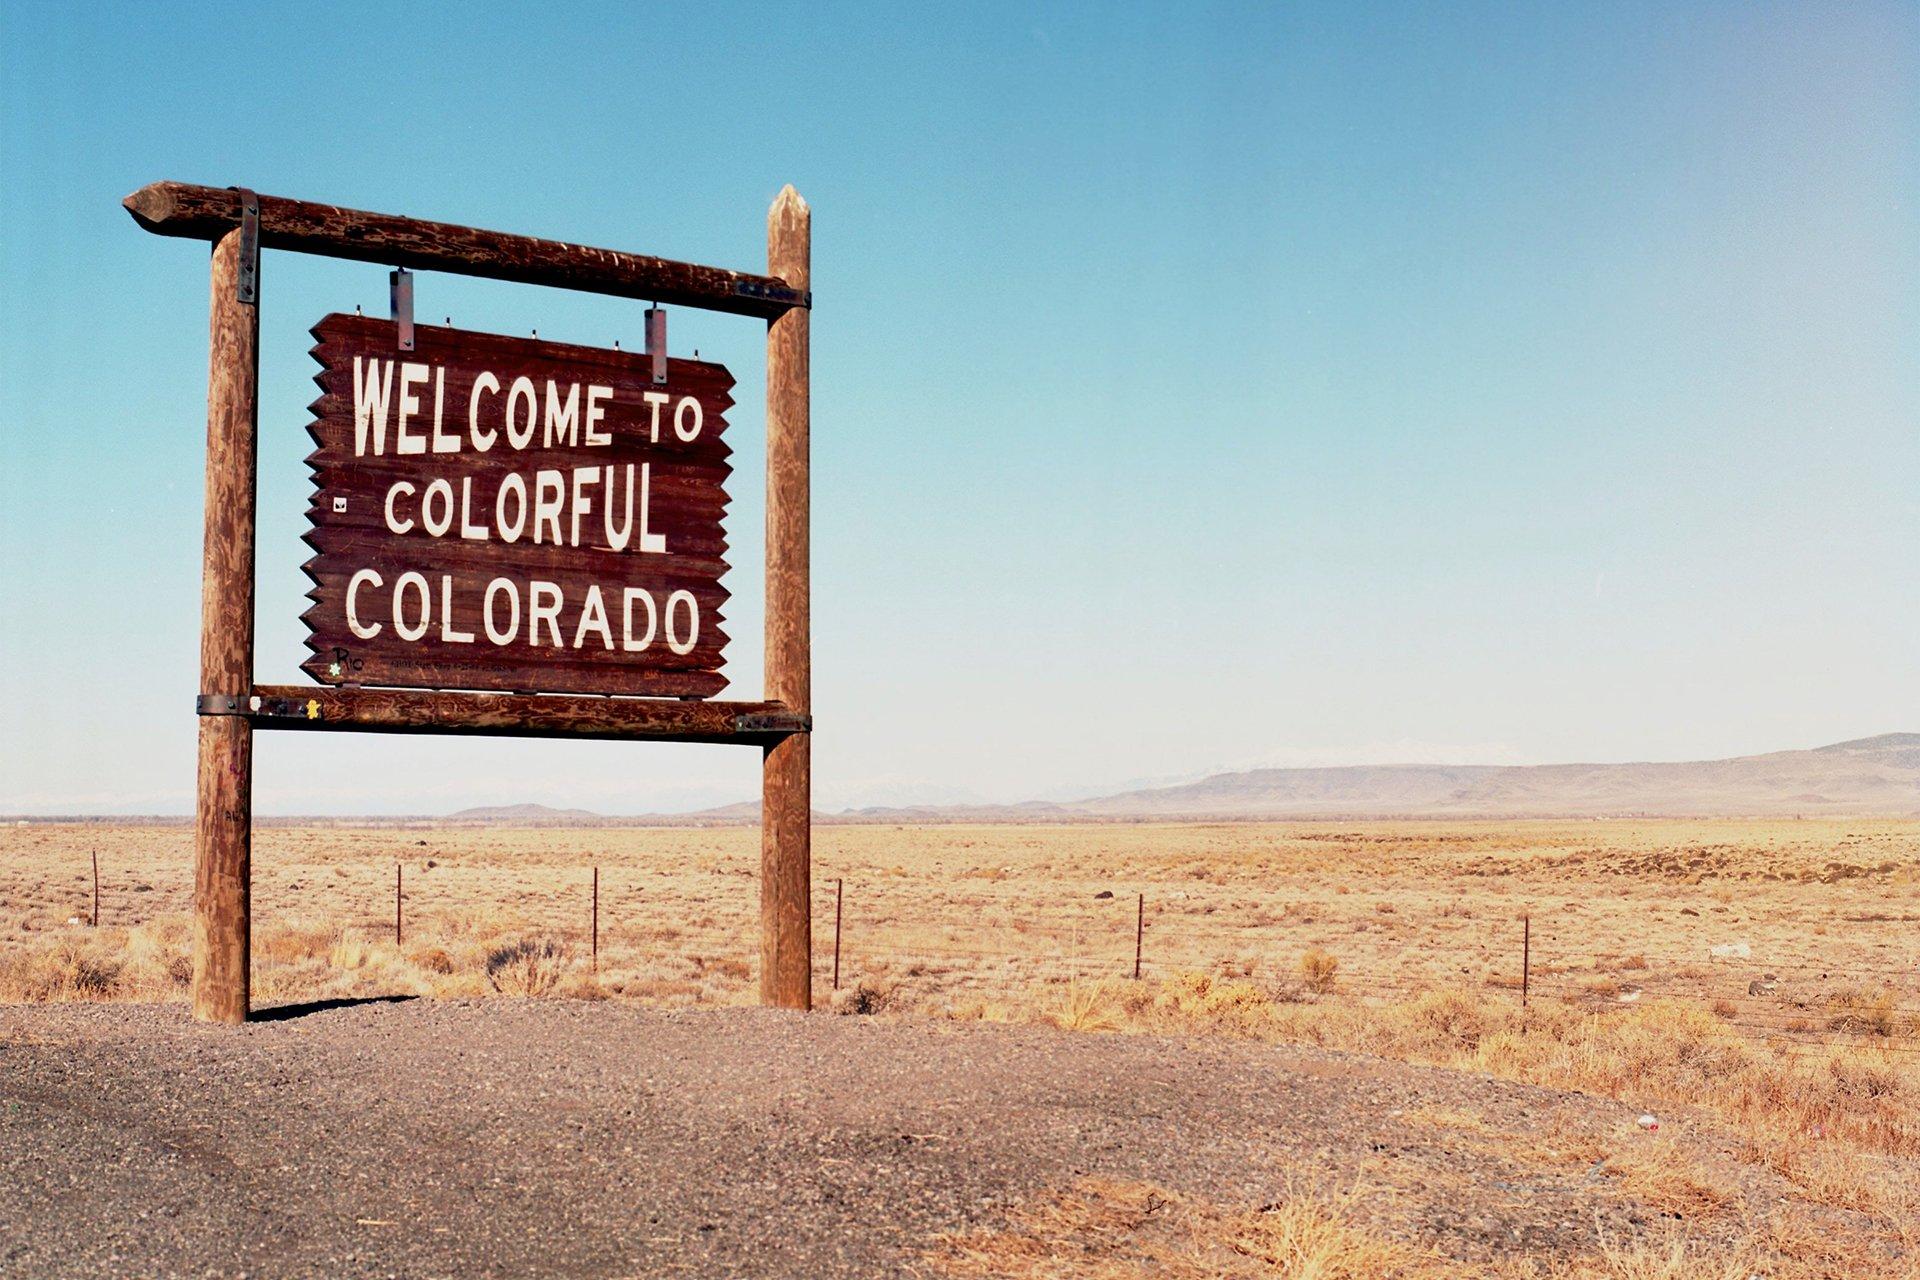 e-Hero--Careers-Colorado Photo by Kait Herzog on Unsplash